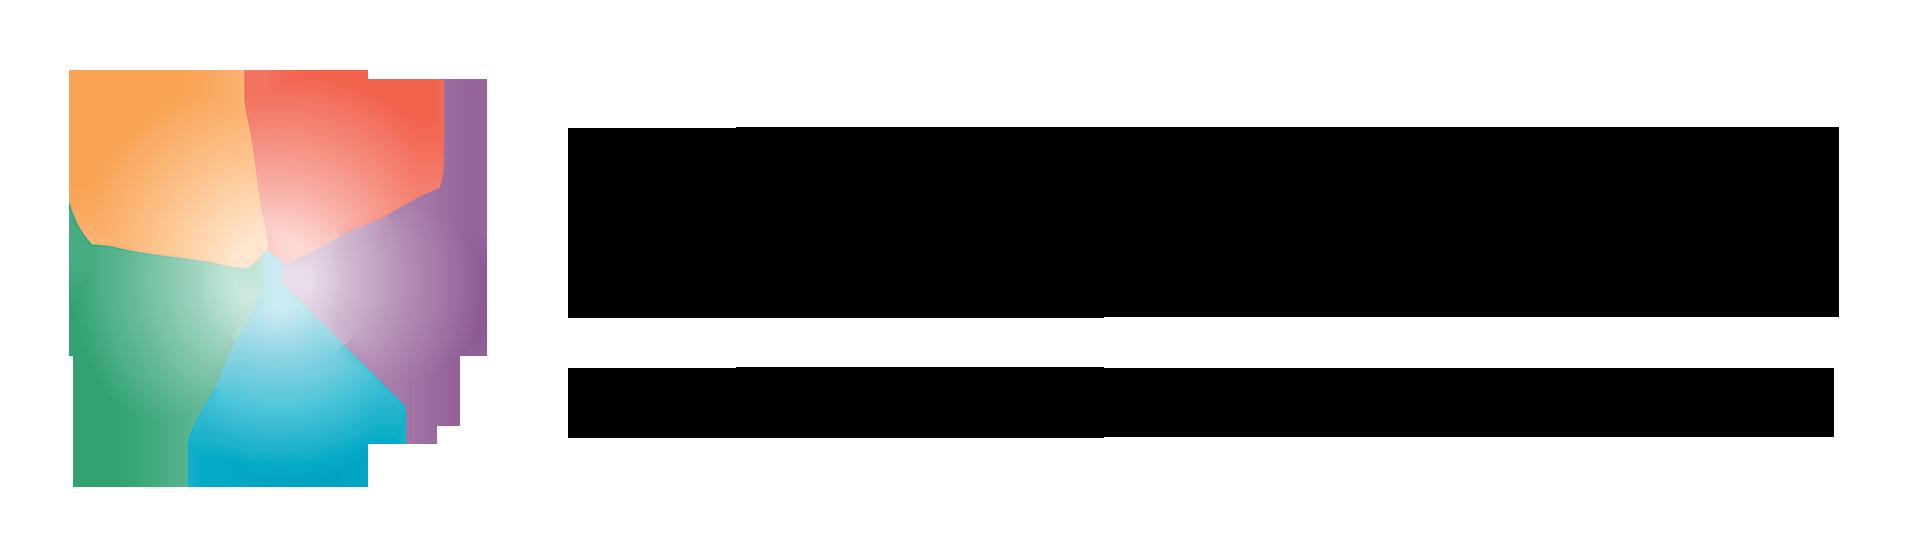 LUMA-keskus Suomi -verkoston logo